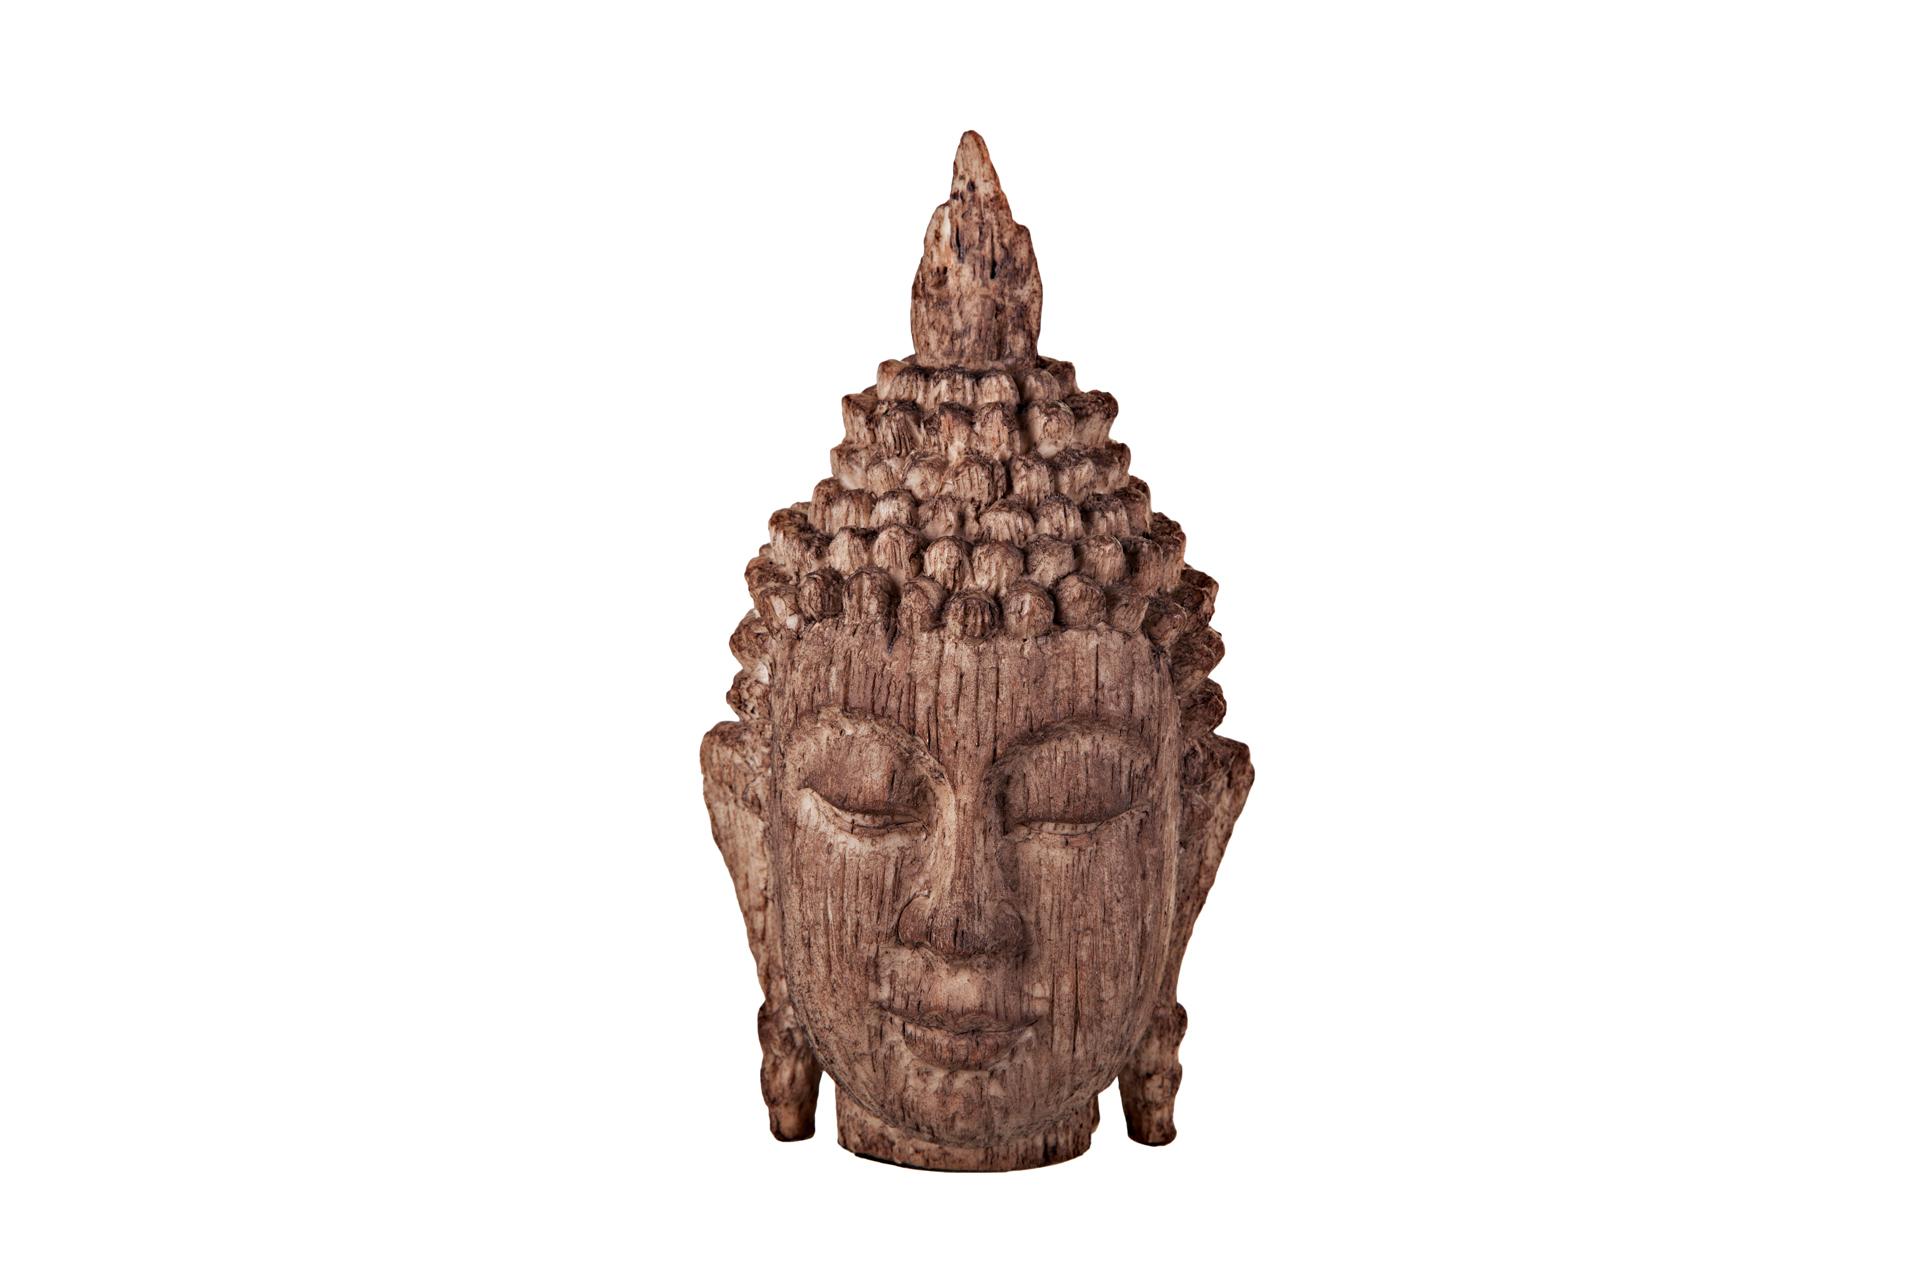 {} ARTEVALUCE Статуэтка Голова Будды (11х12х20 см) статуэтка африканка федерация статуэтка африканка